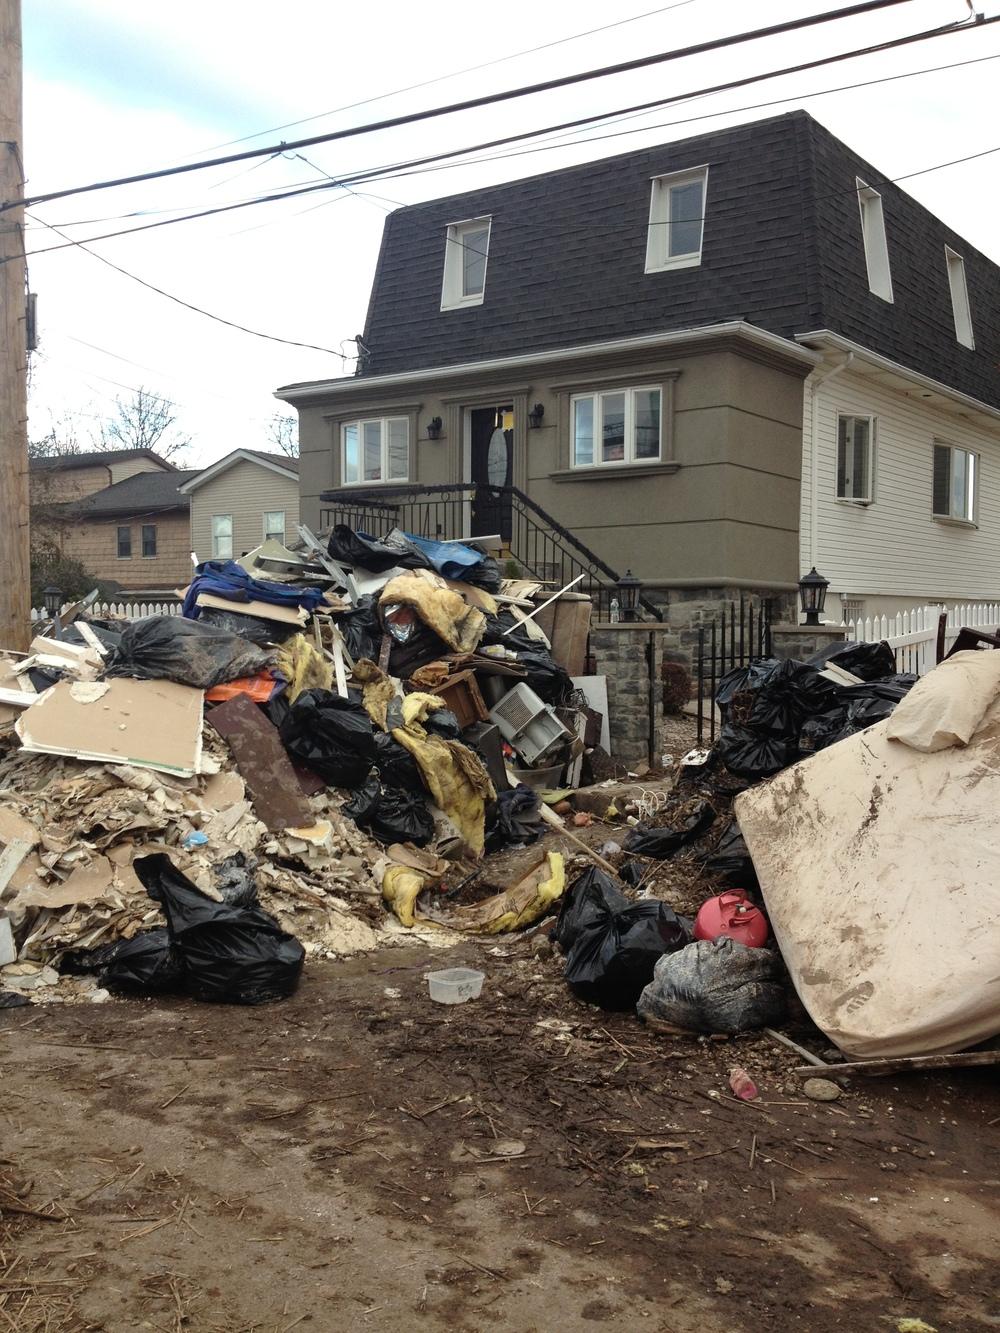 Staten Island debris & trash piles